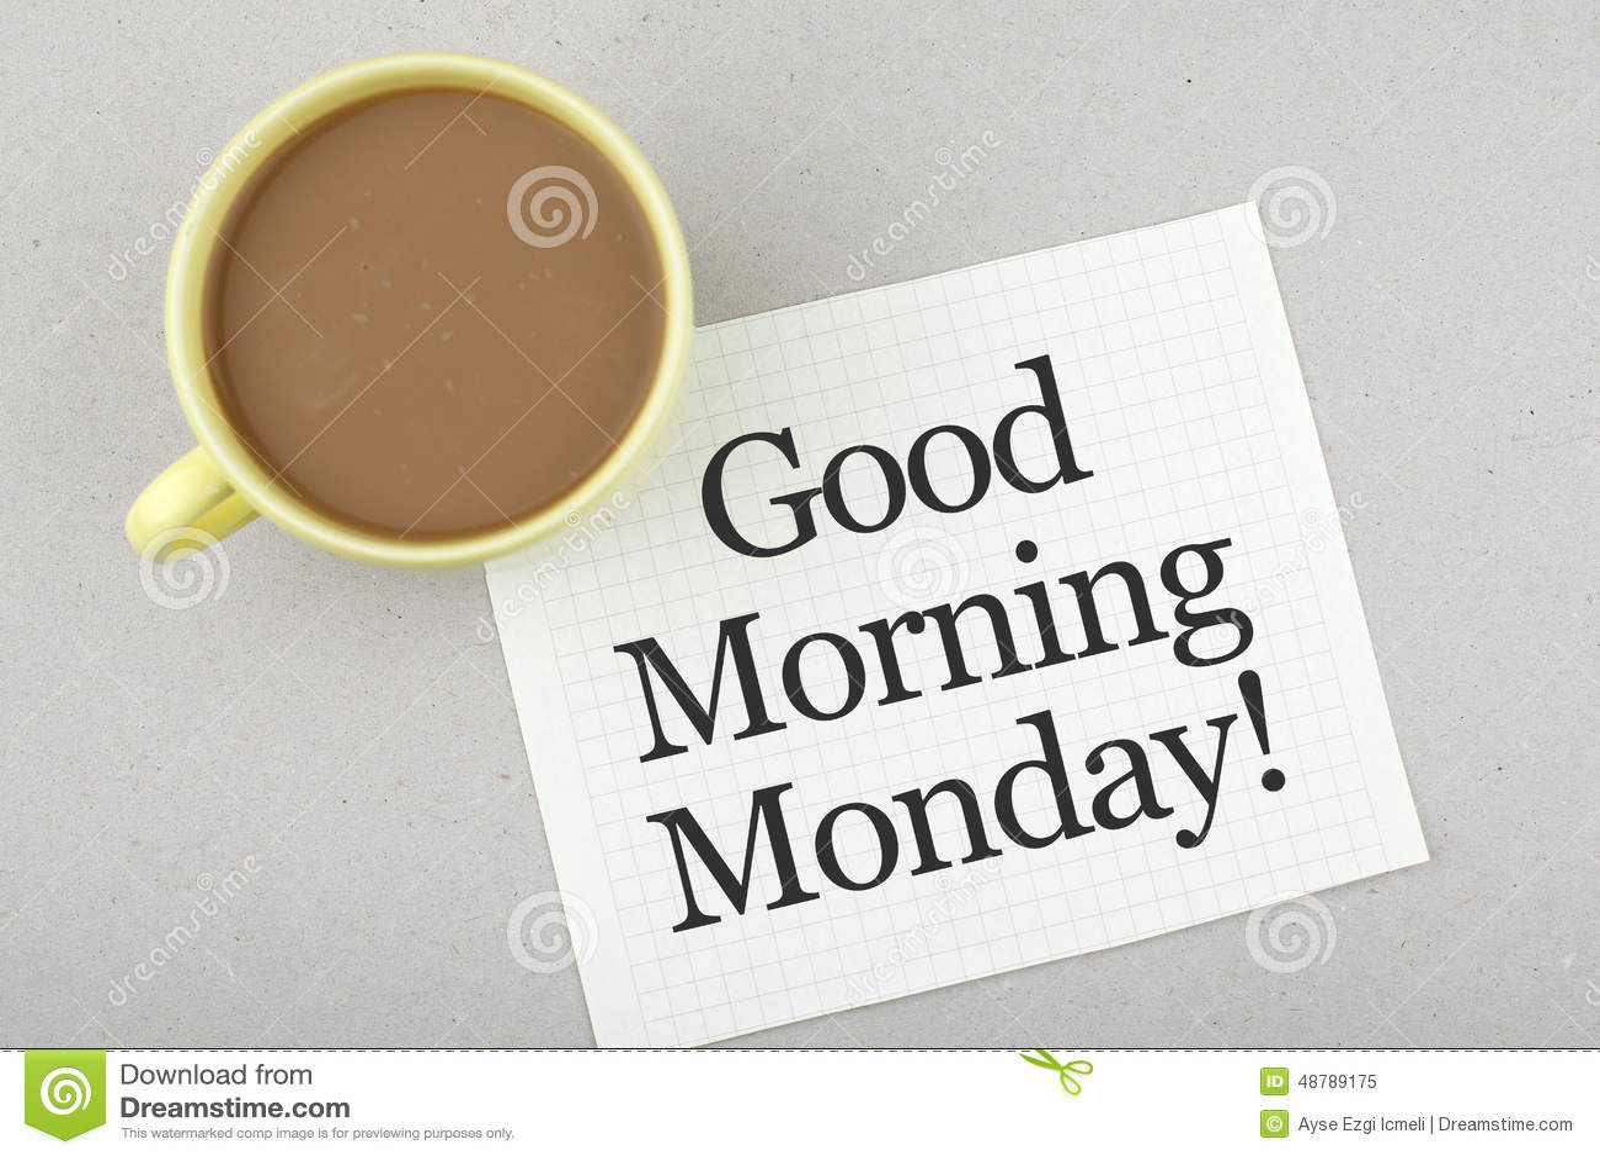 Good Morning Monday Note Stock Image Image Of Morning 48789175